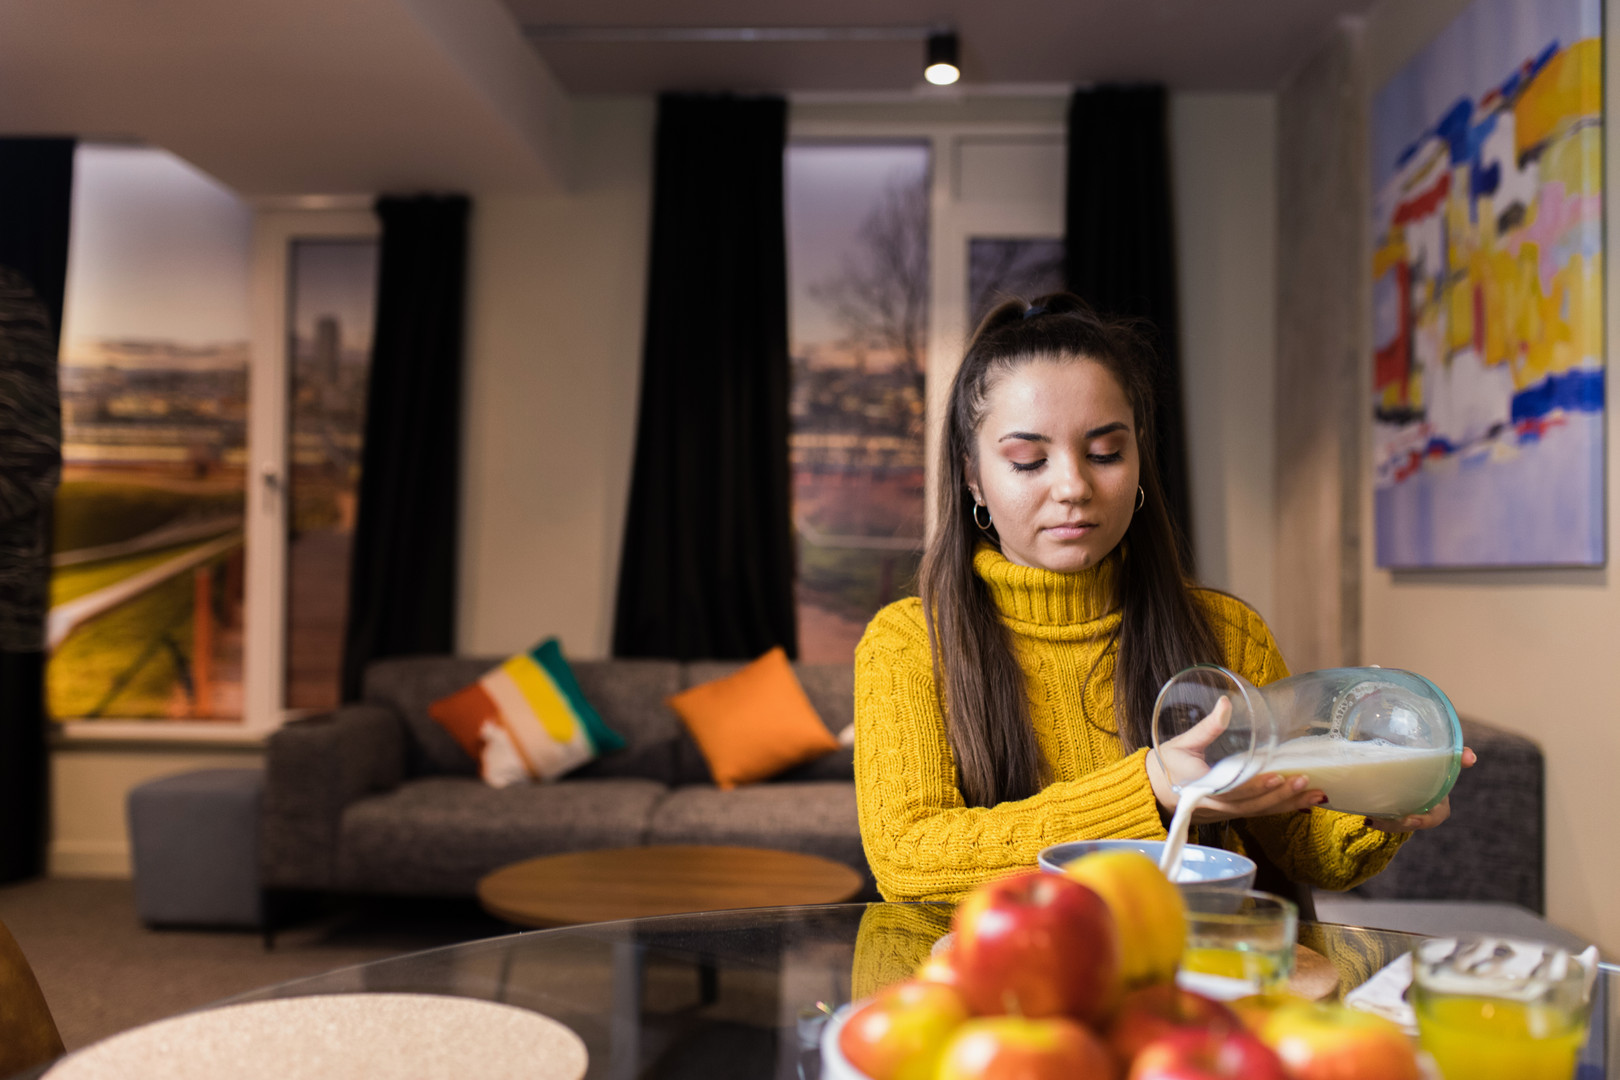 Liv Student Accomidation in Sheffield